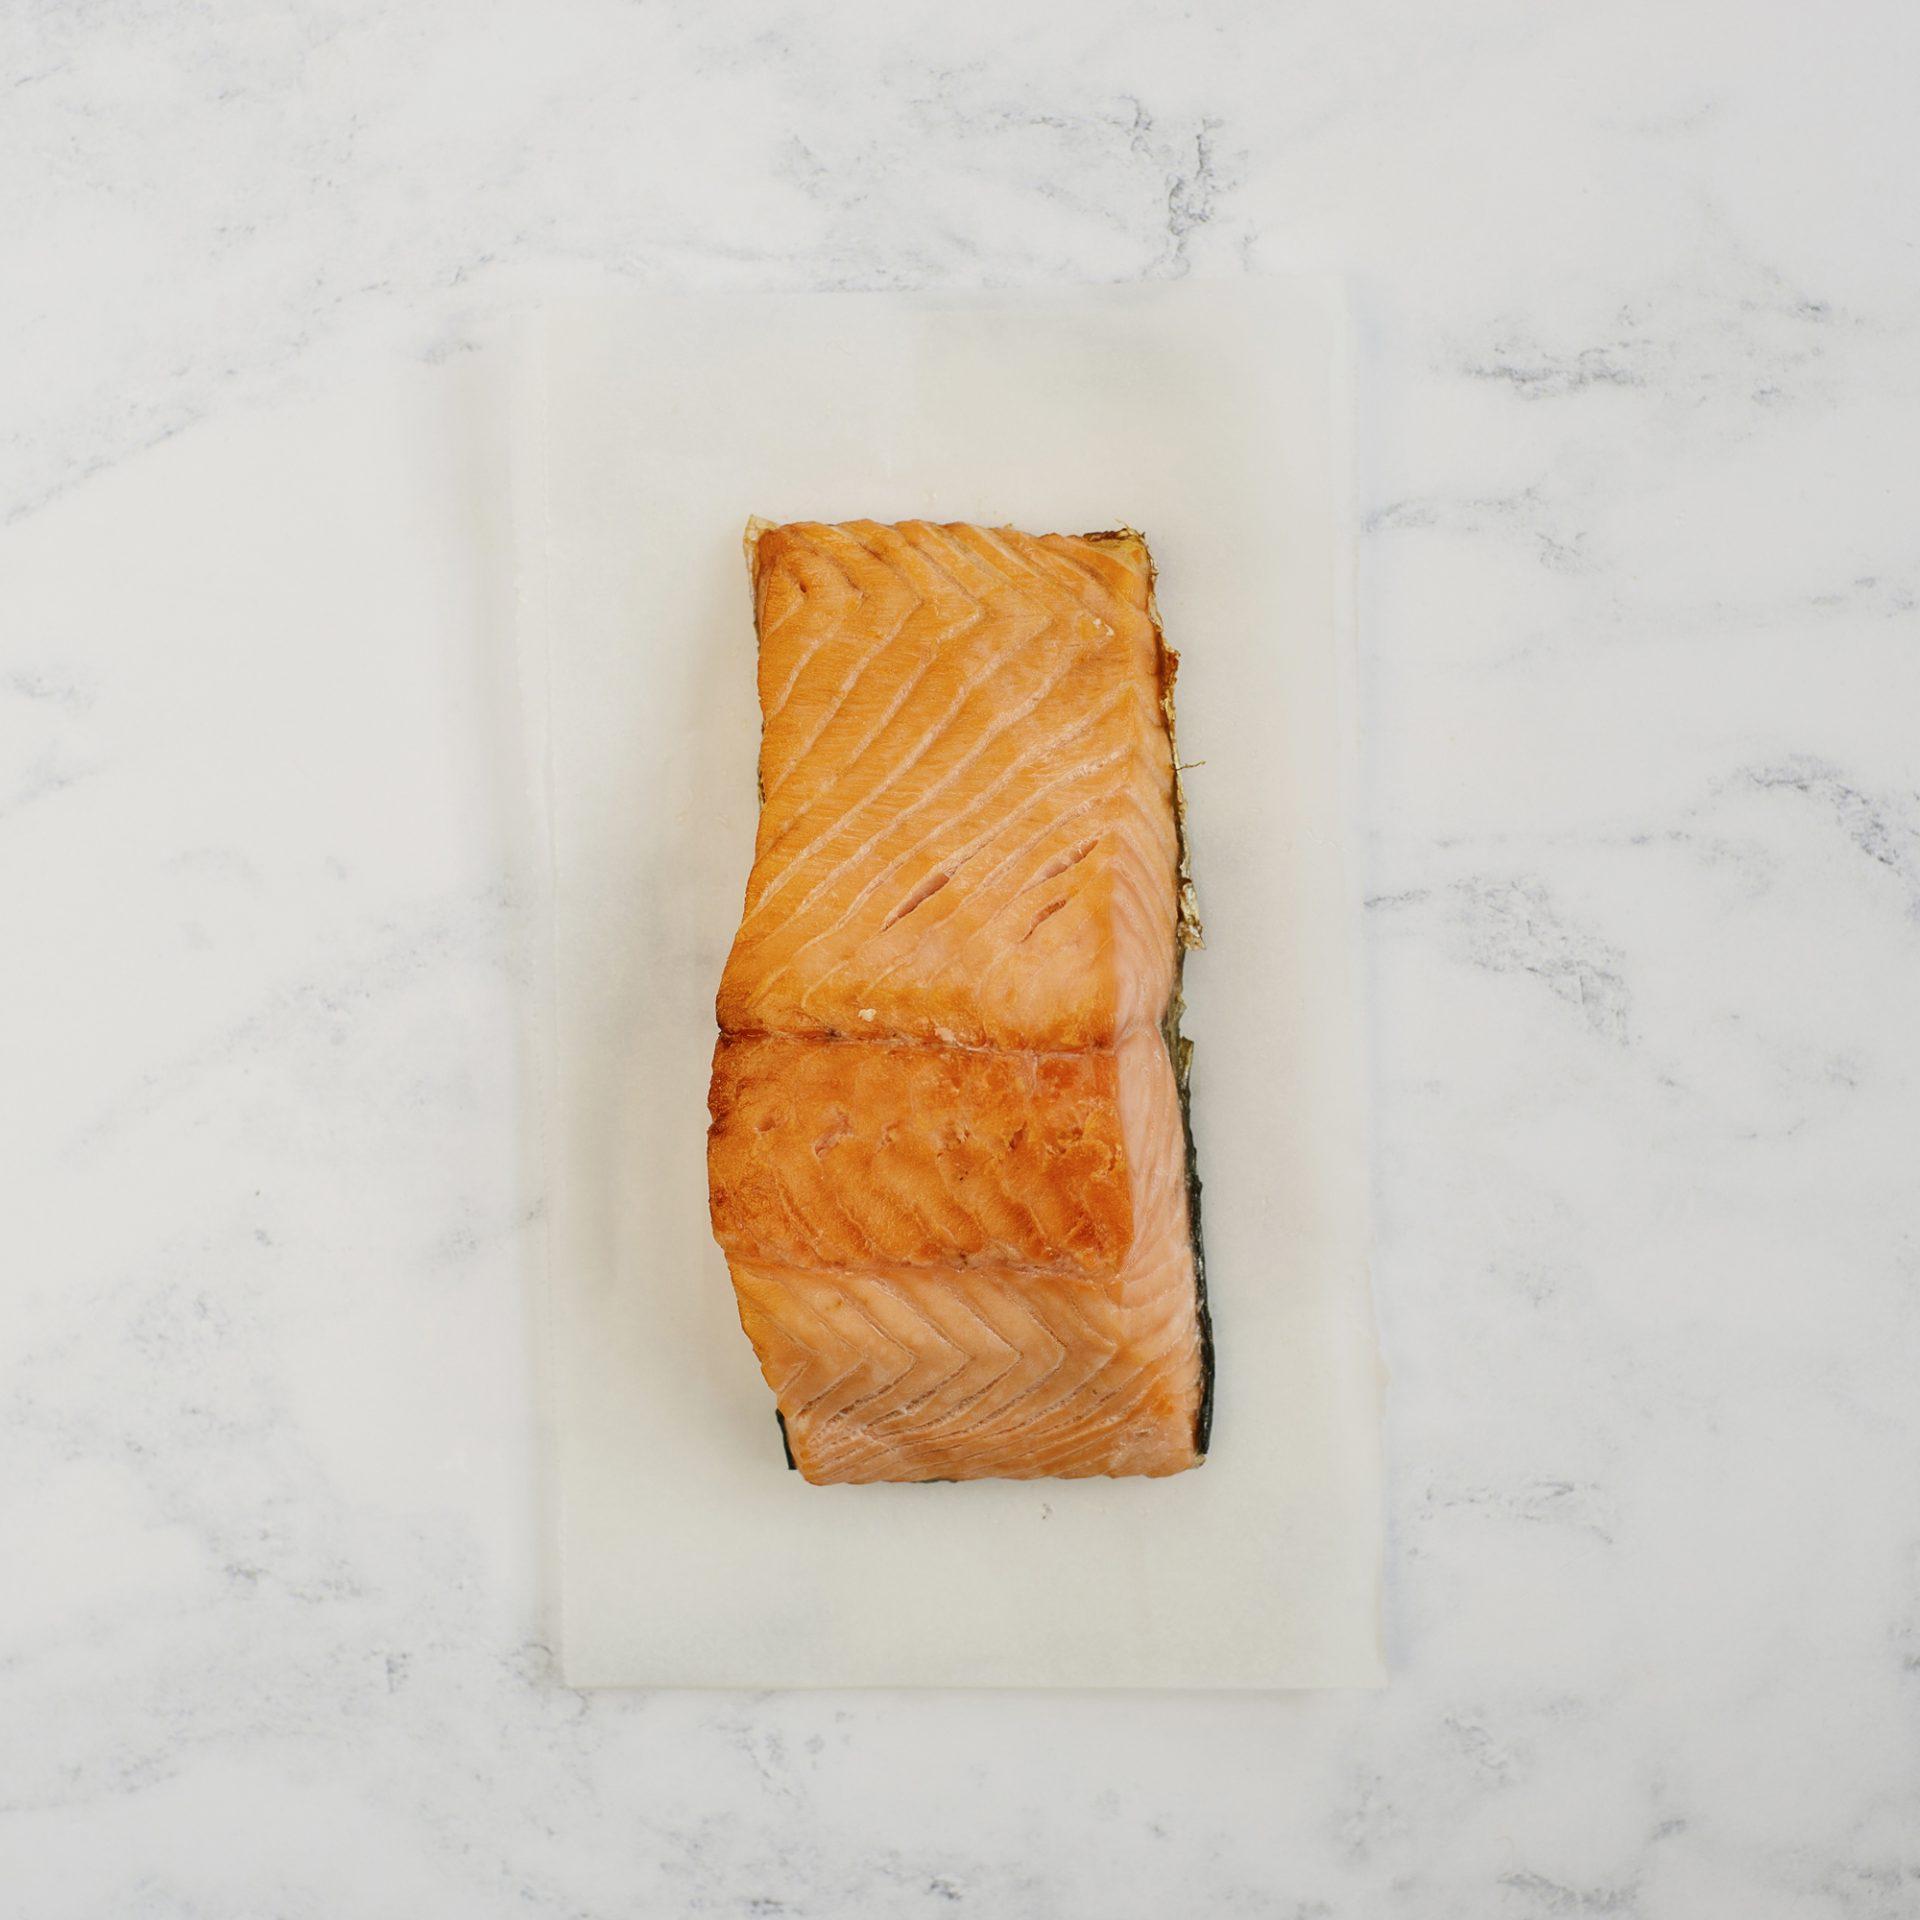 Hot Smoked Salmon Portion